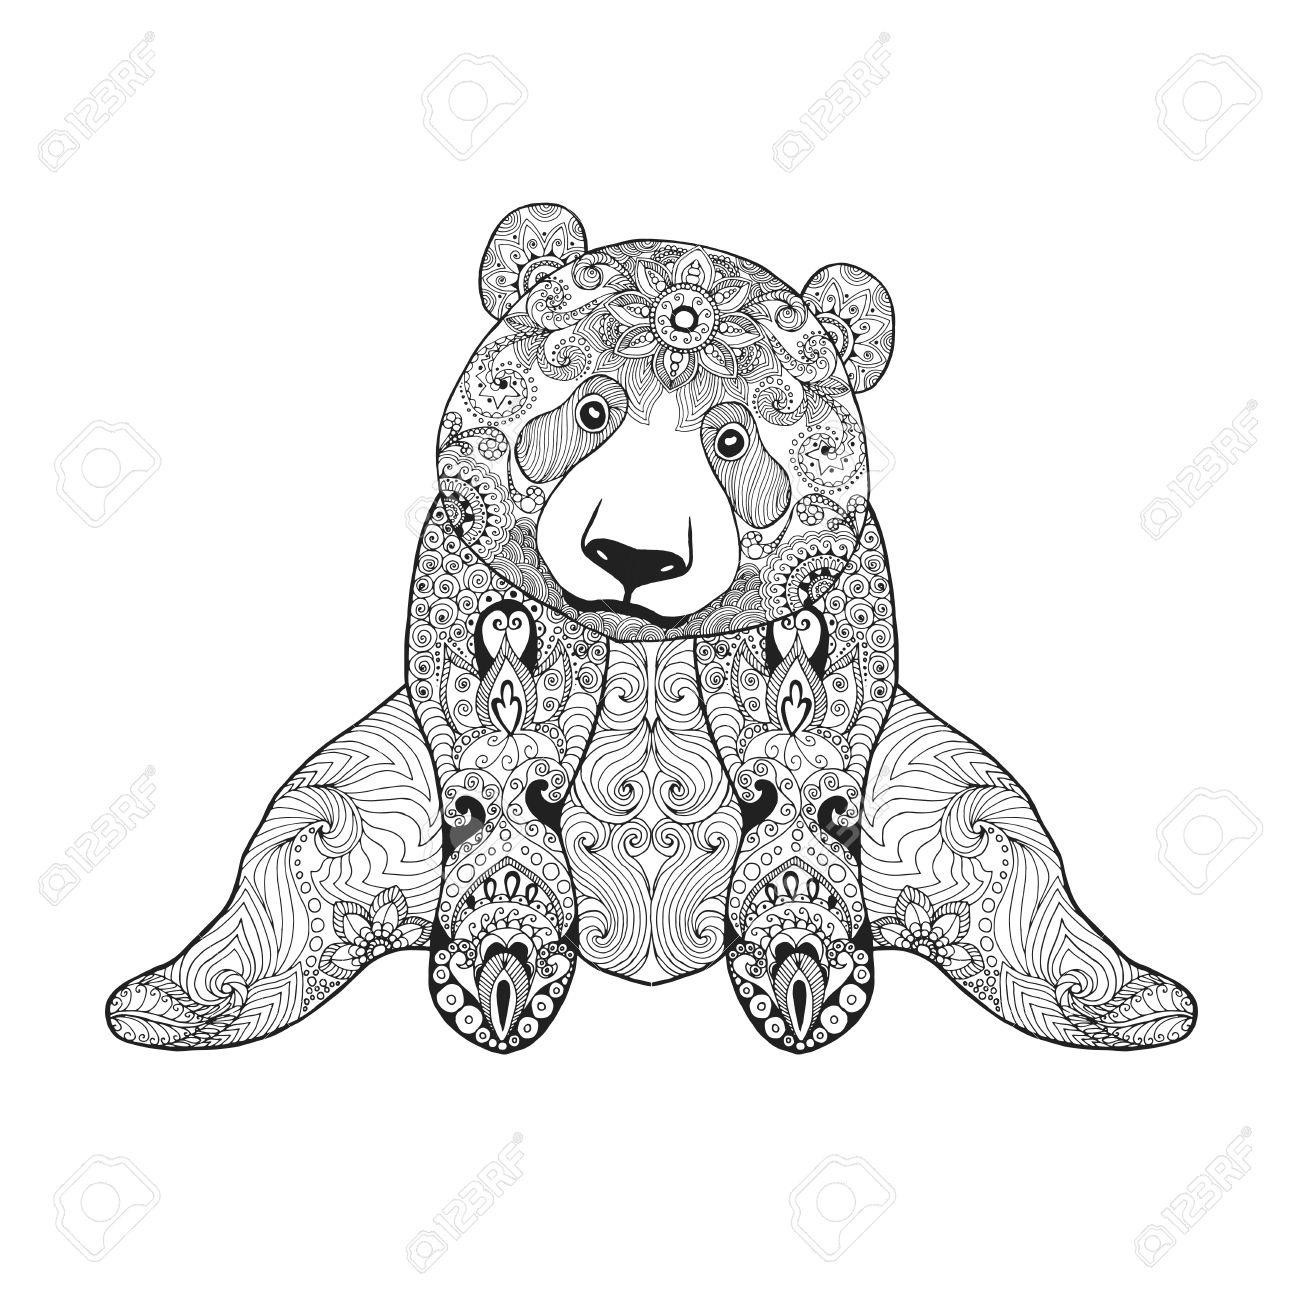 Oso De Panda Lindo. Mano Blanco Y Negro Dibujado Animales Garabato ...